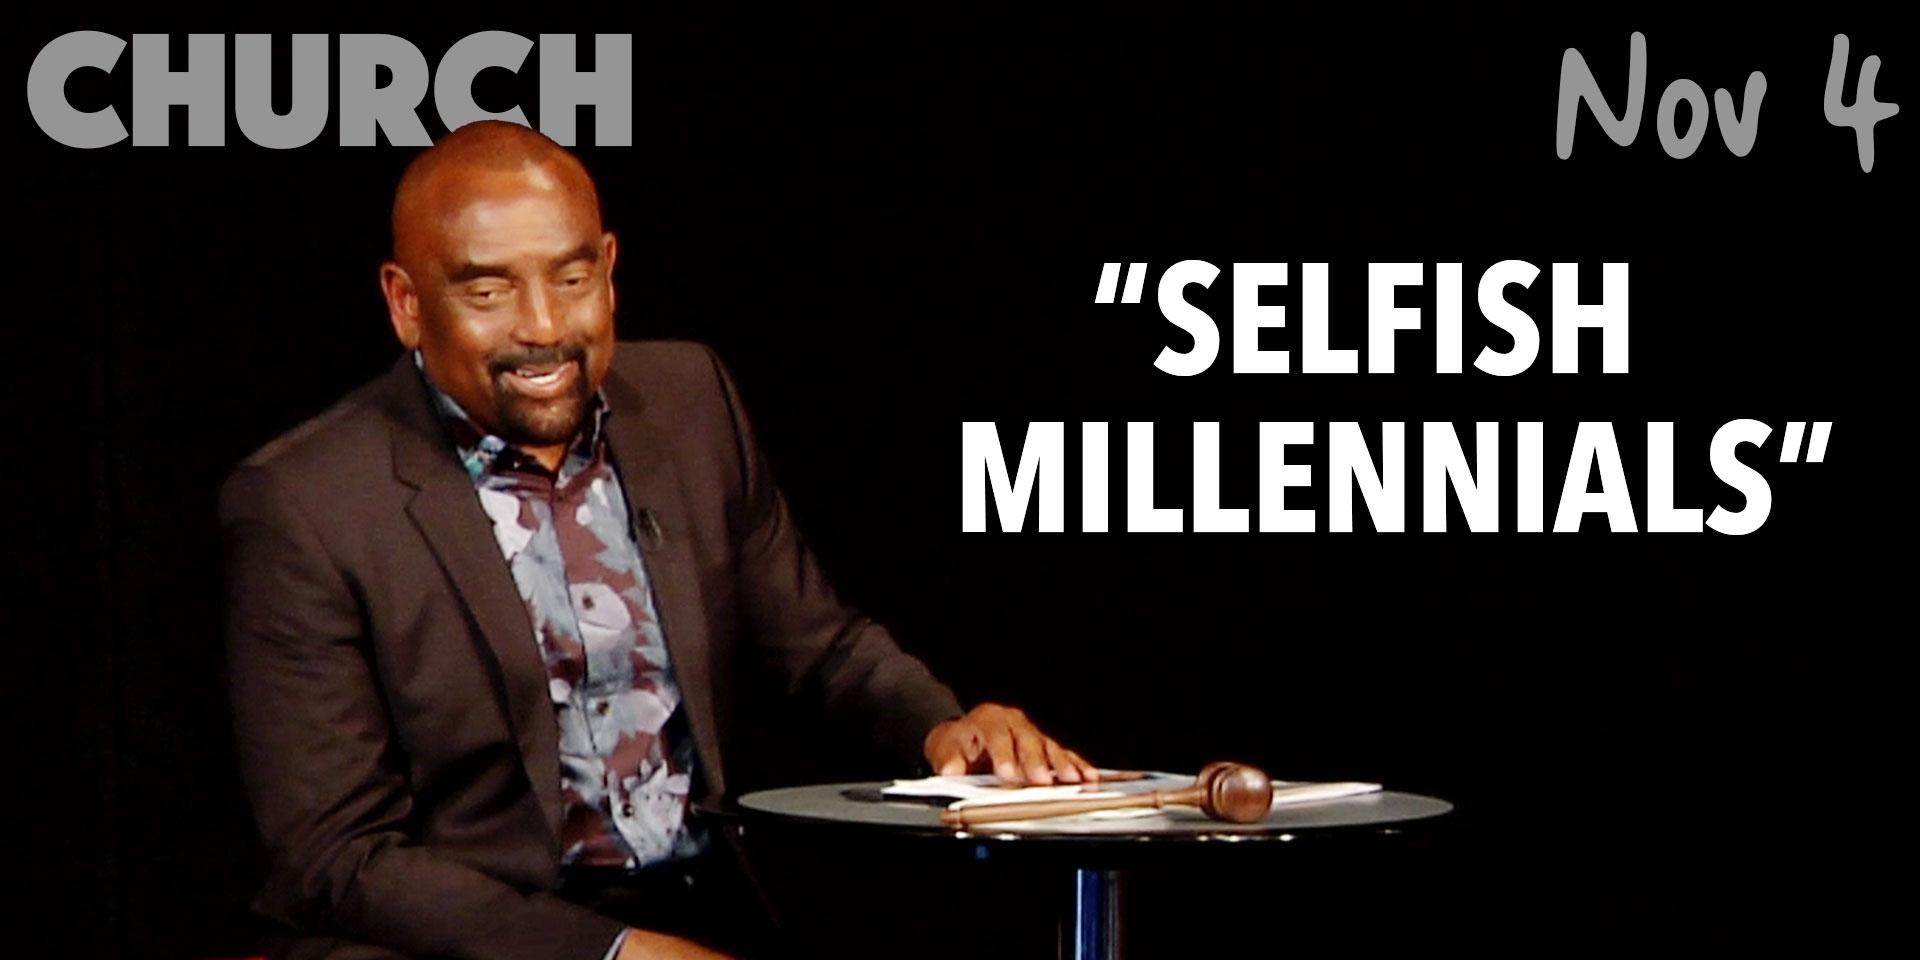 """Selfish Millennials"" (Church, Nov 4)"